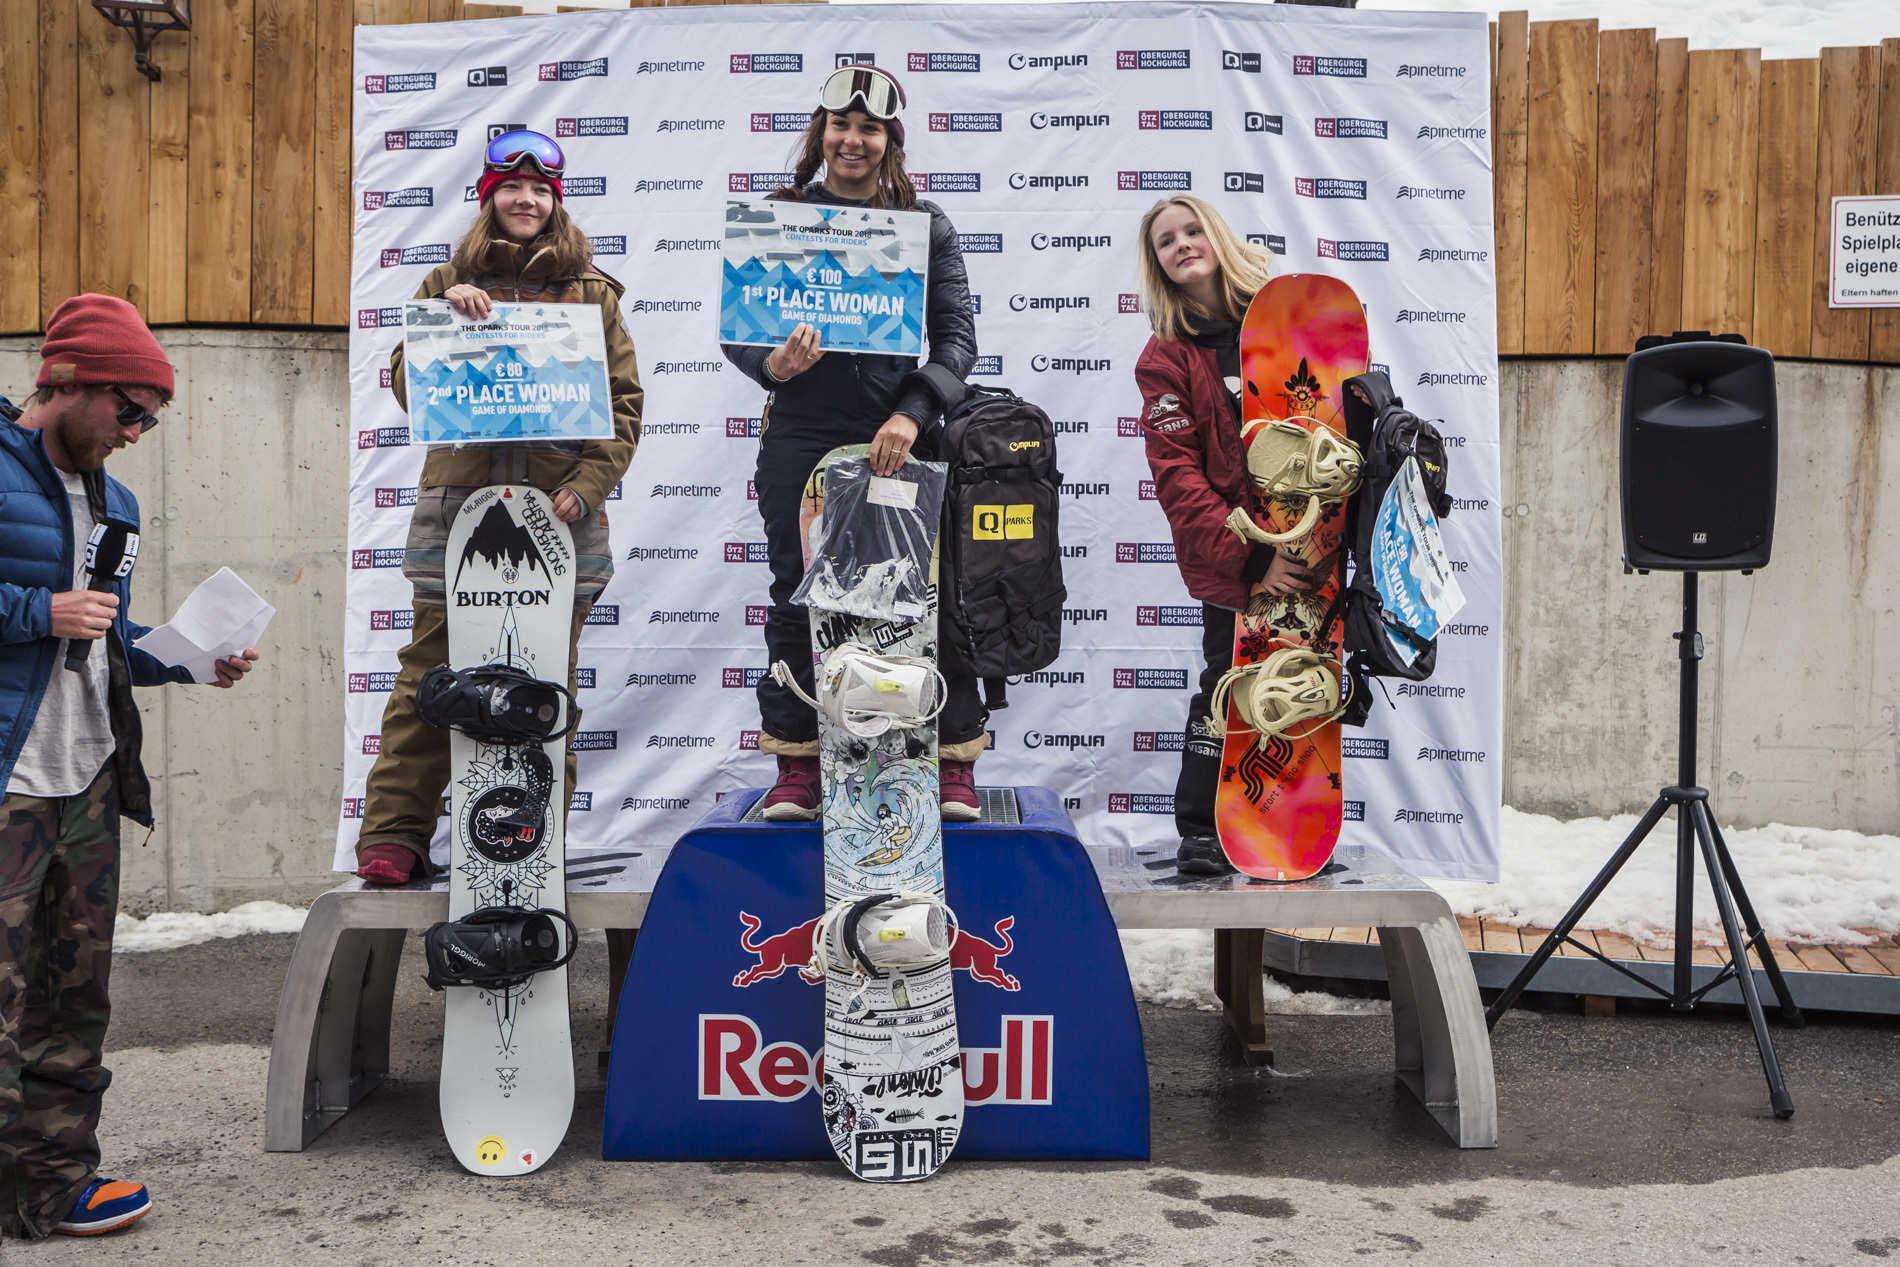 obergurgl tourfinale 15 04 2018 roland haschka qparks 014